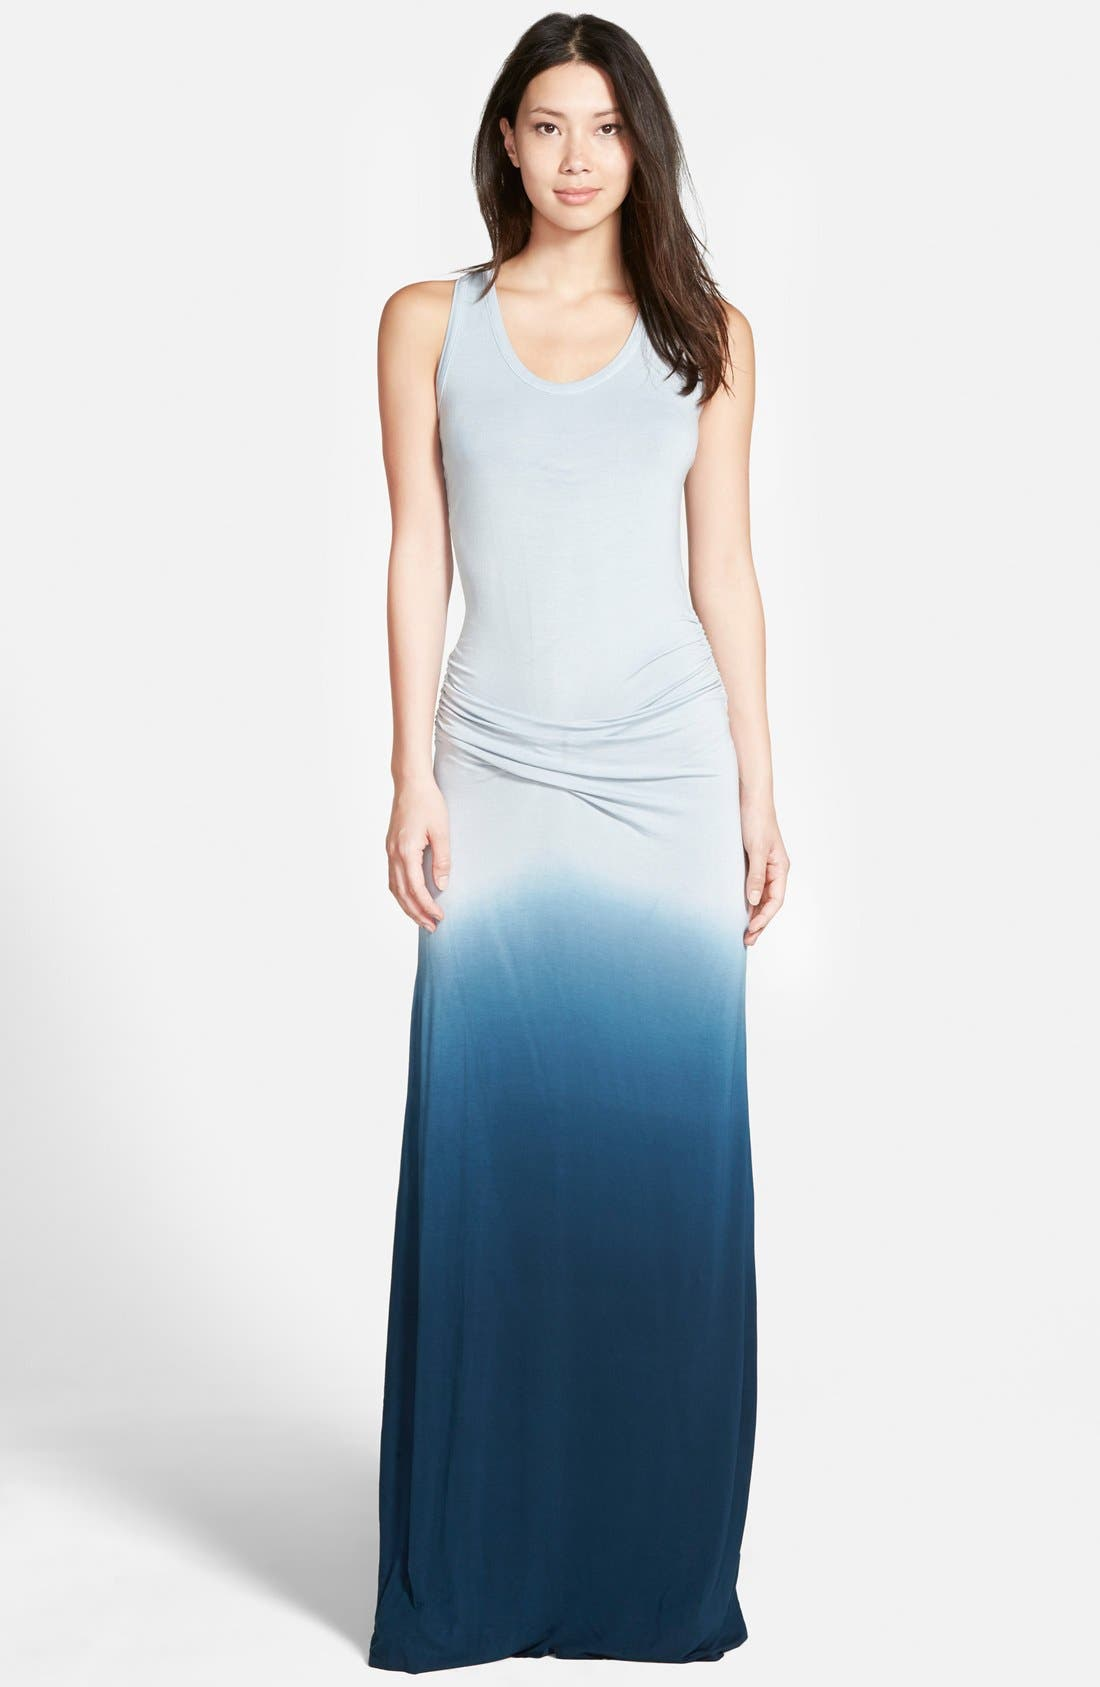 Main Image - Young, Fabulous & Broke 'Hamptons' Maxi Tank Dress